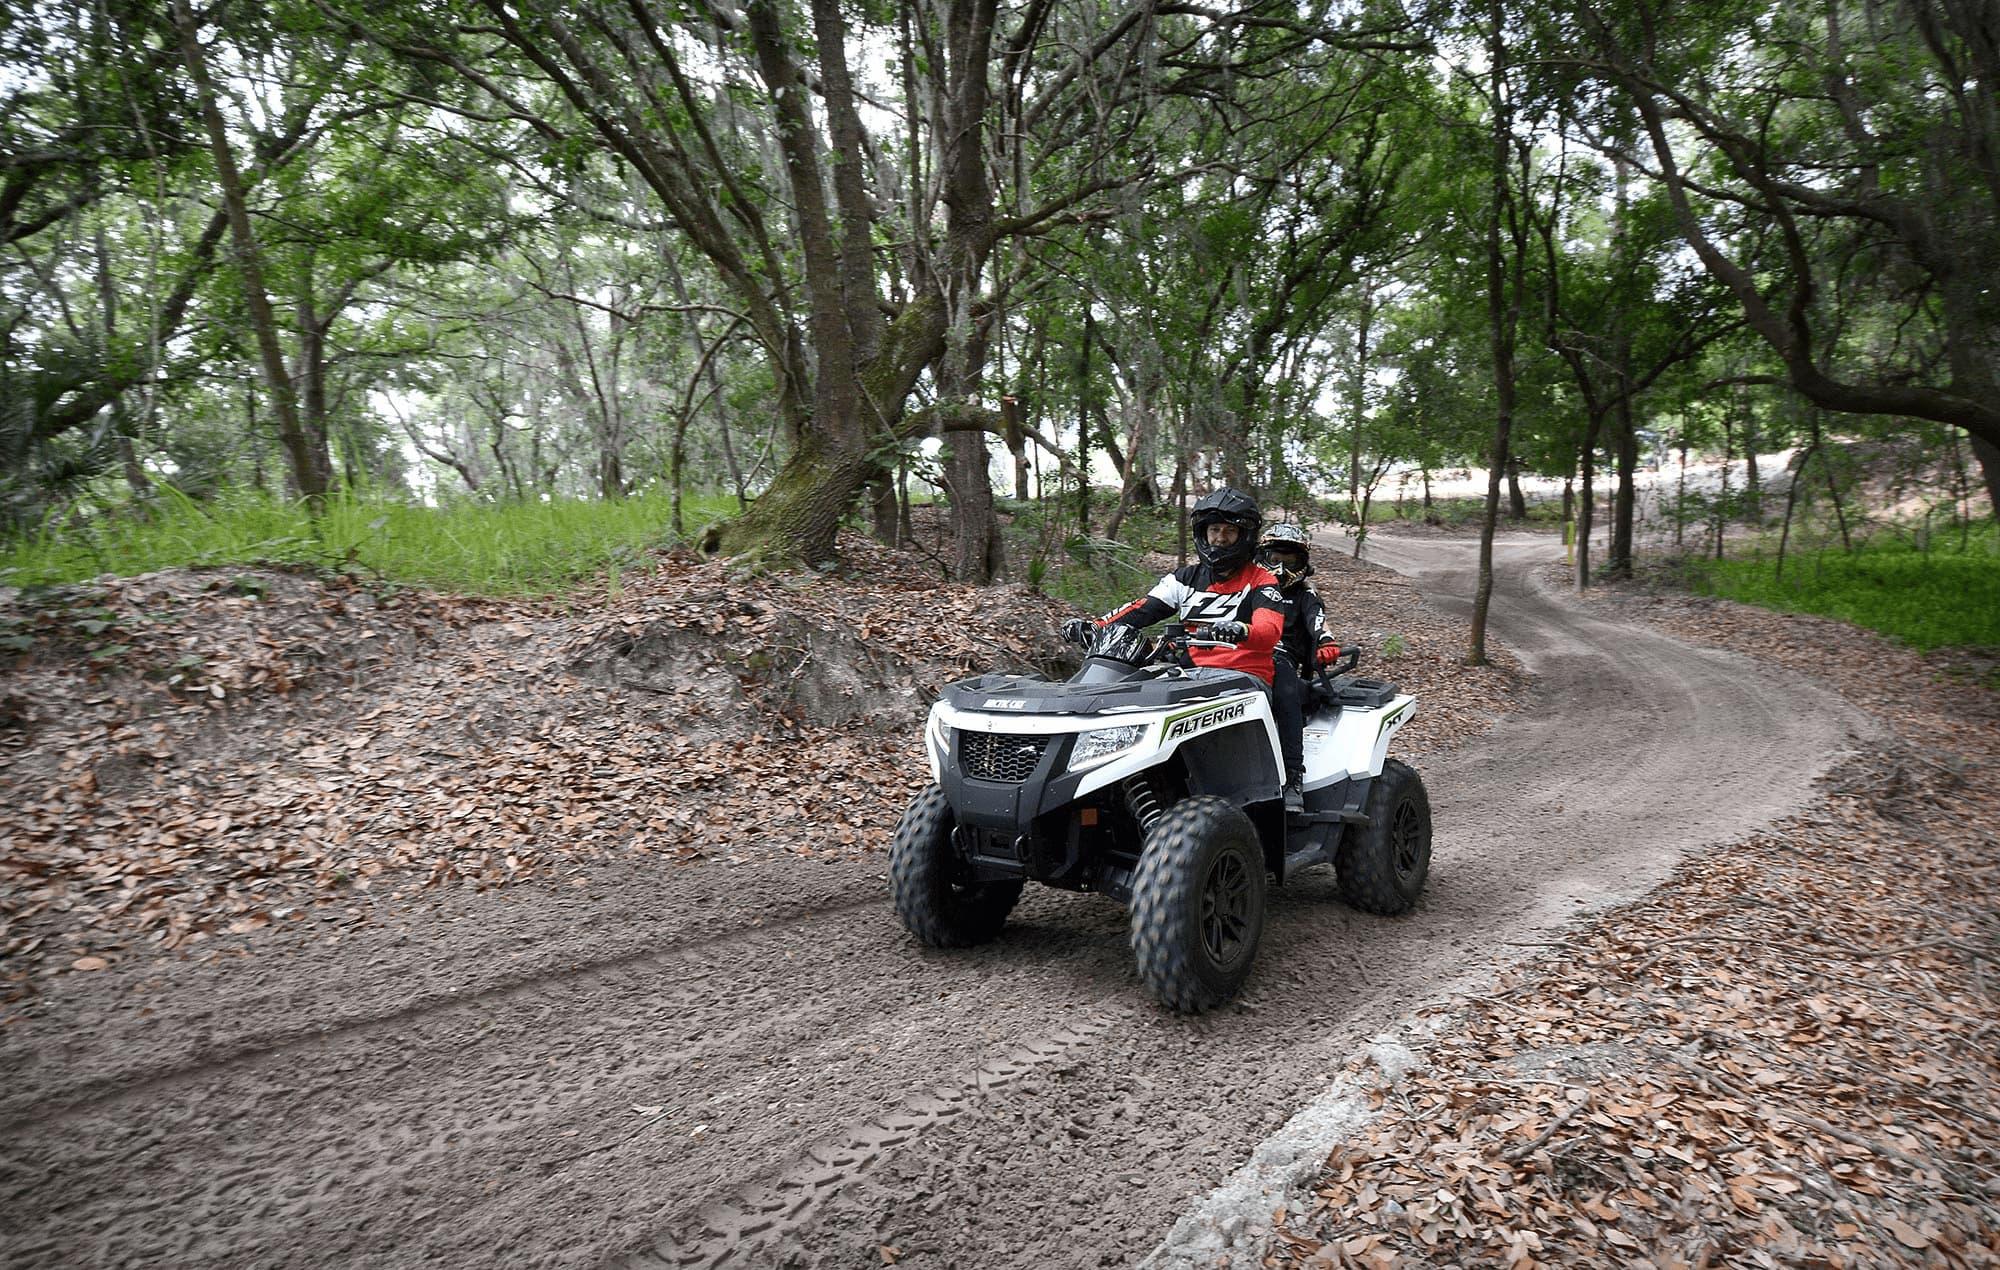 ATV Trails Central Florida, Bone Valley ATV Park.